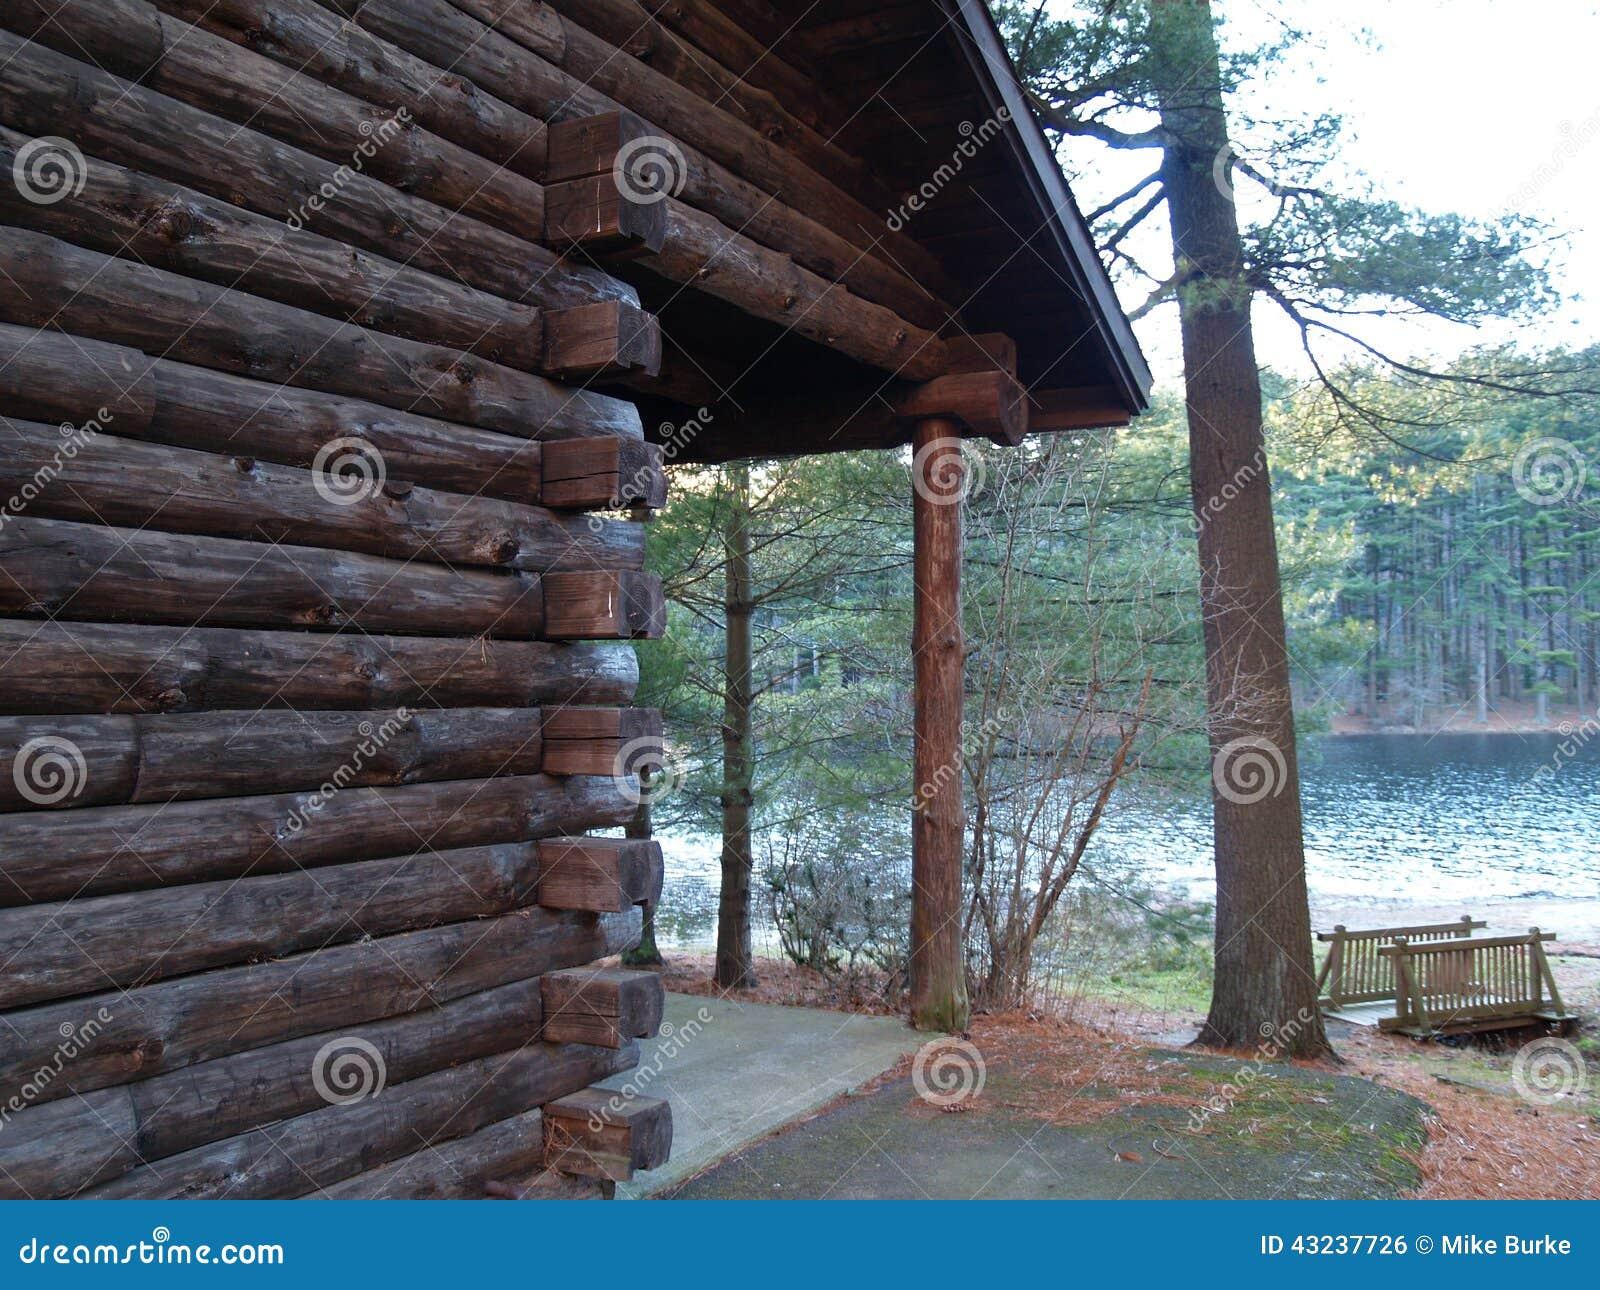 Log Cabin Overlooking Lake Stock Photo Image Of Nature